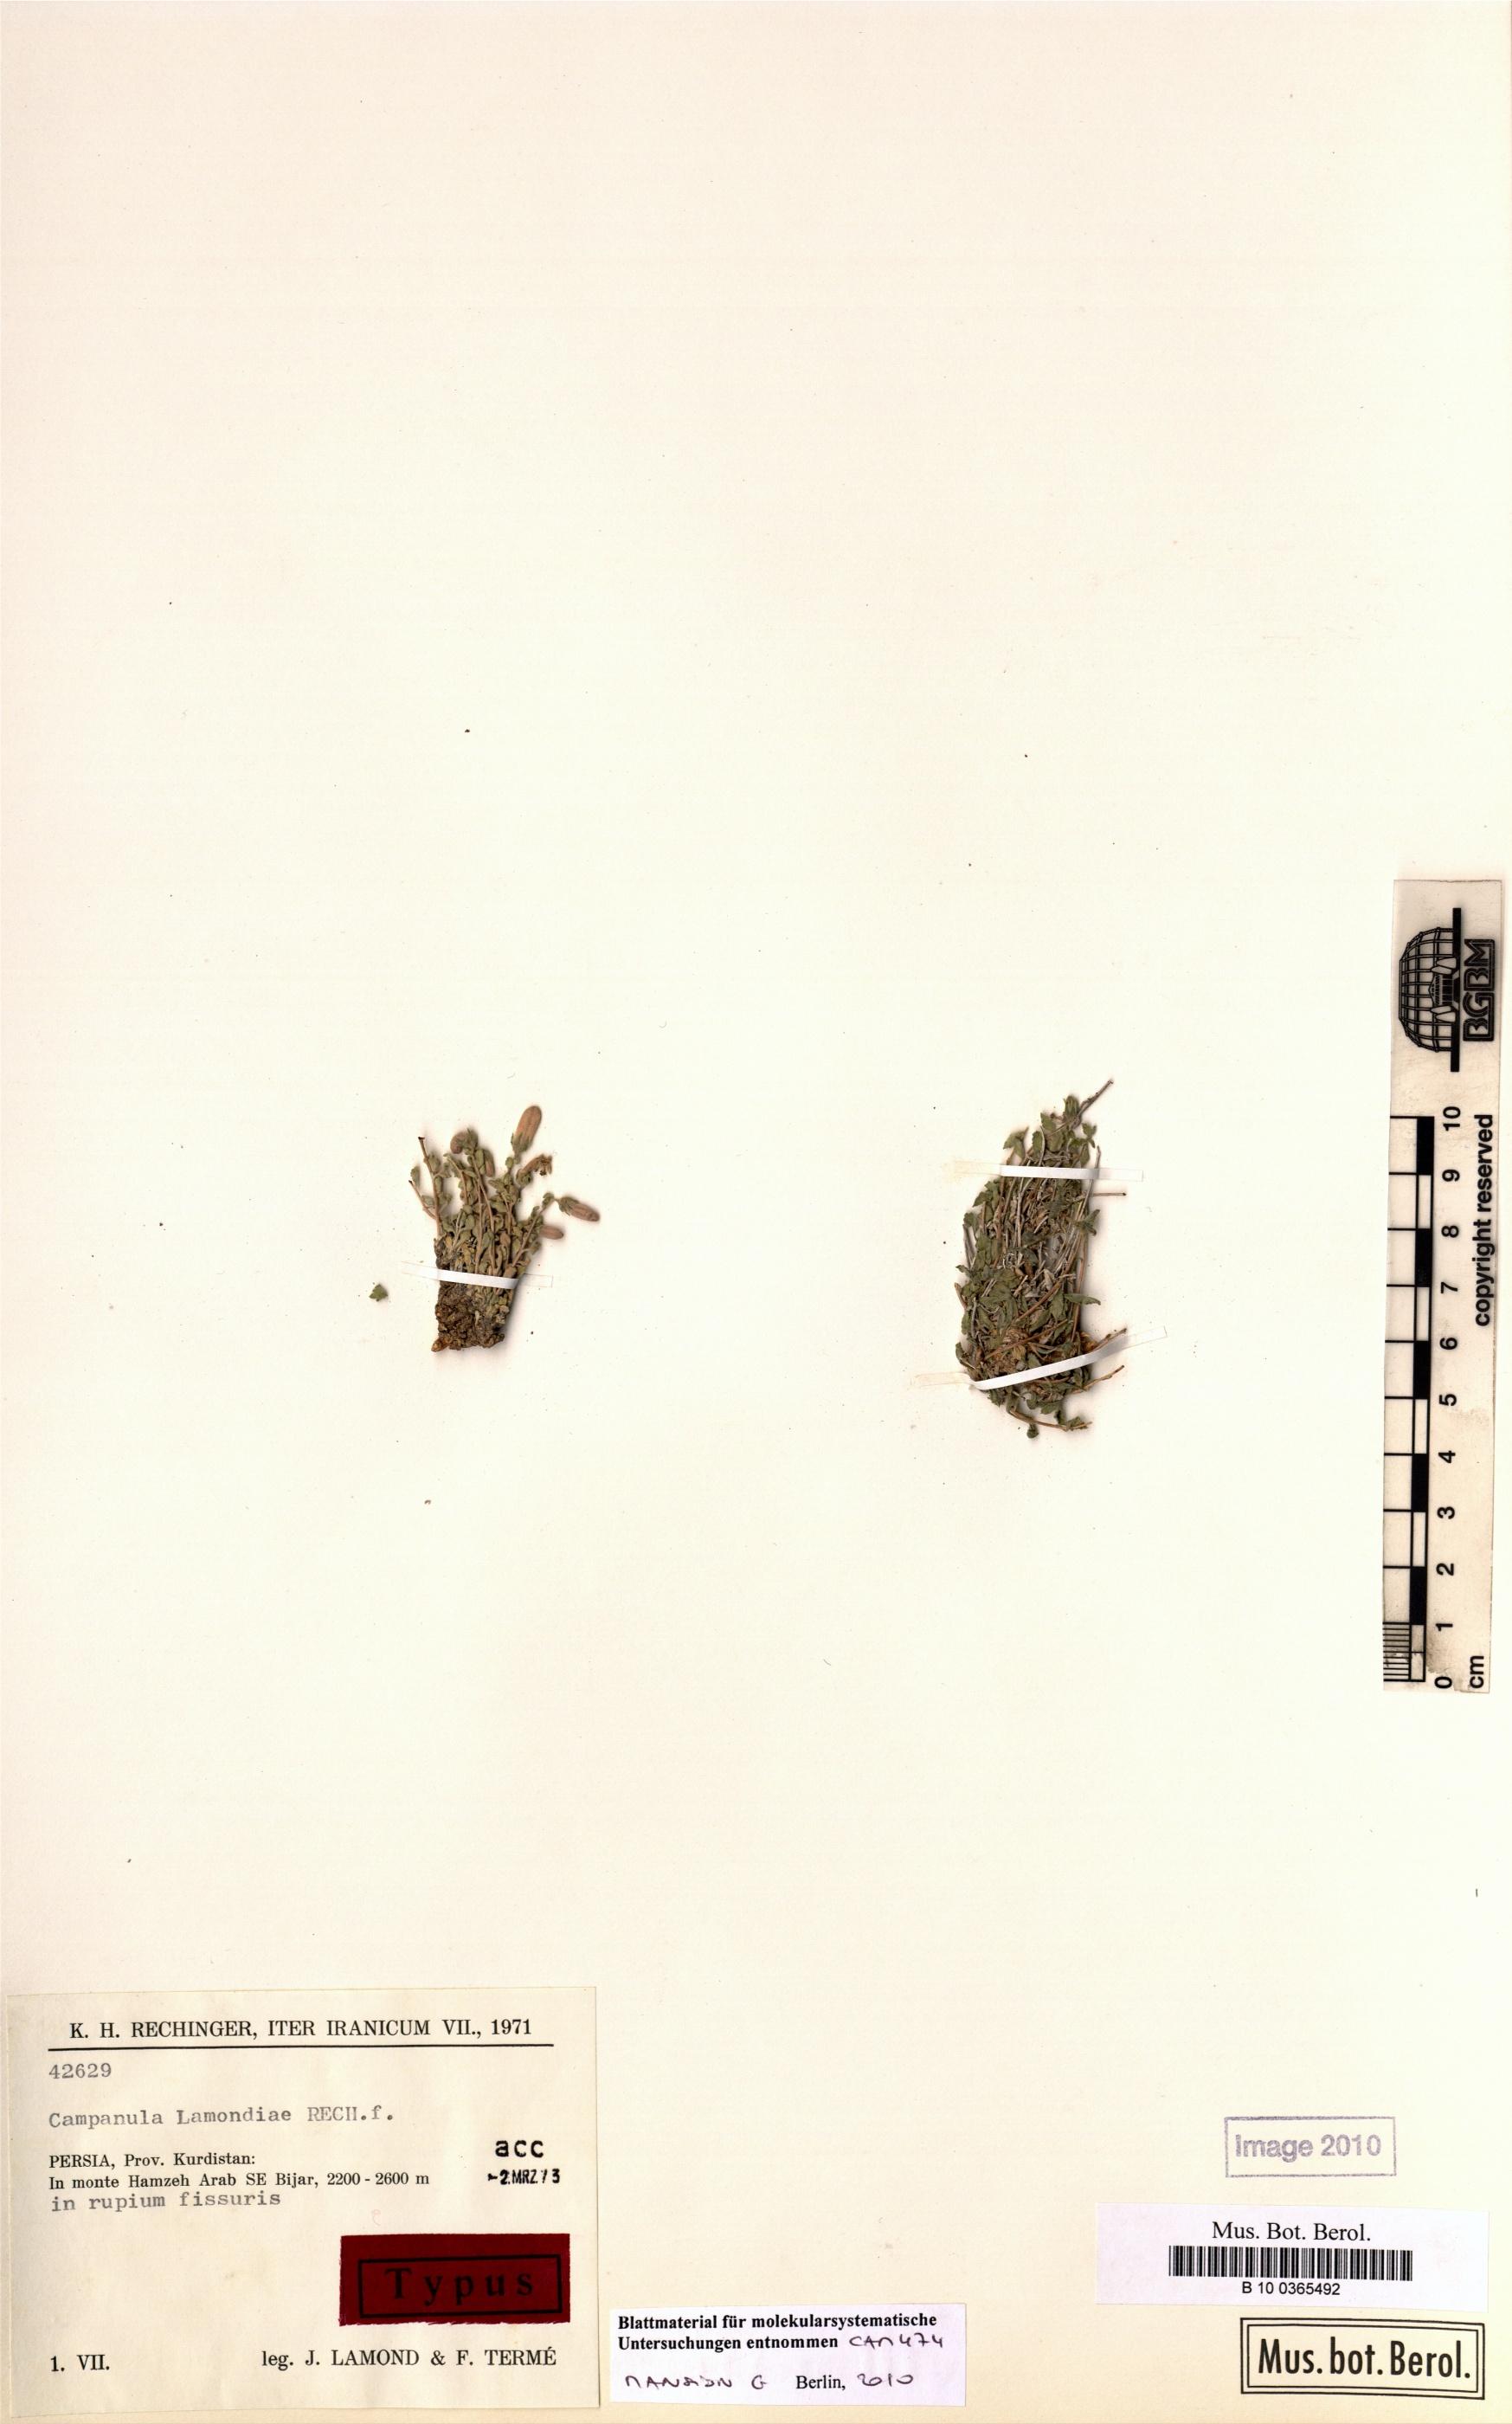 http://ww2.bgbm.org/herbarium/images/B/10/03/65/49/b_10_0365492.jpg